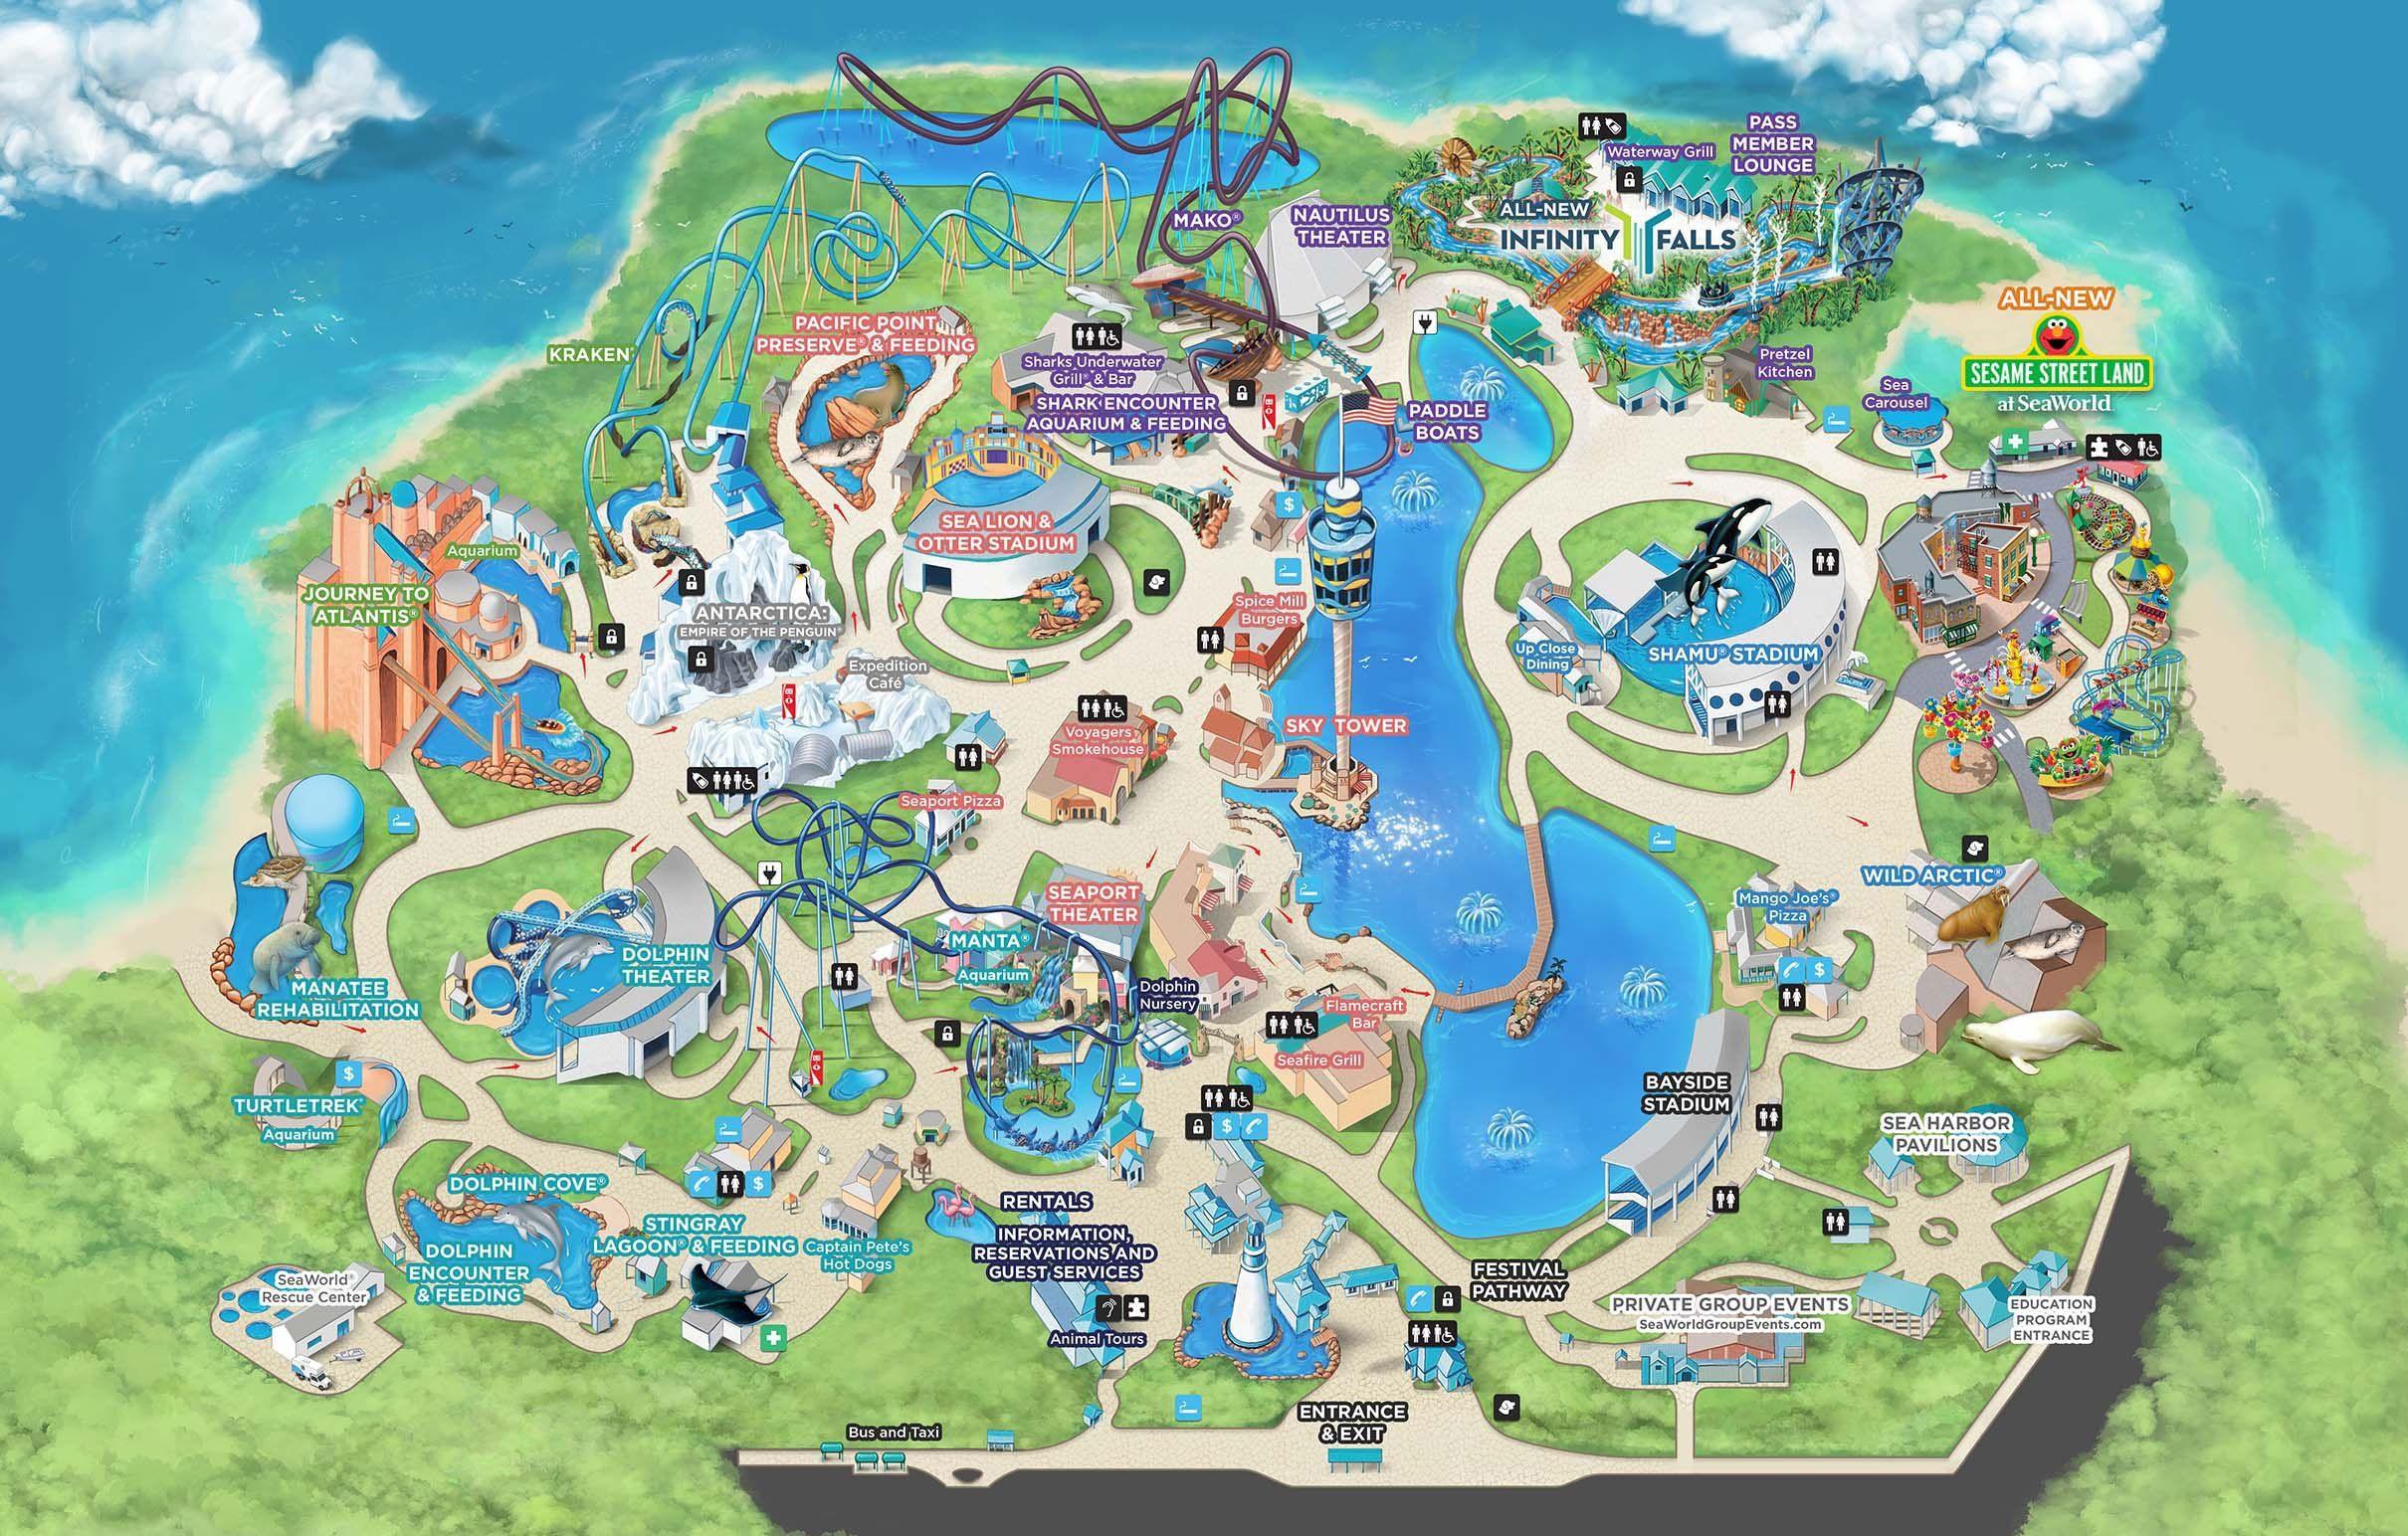 e3246e03e9c068079e76102fd29e27bc - Bus From International Drive To Busch Gardens